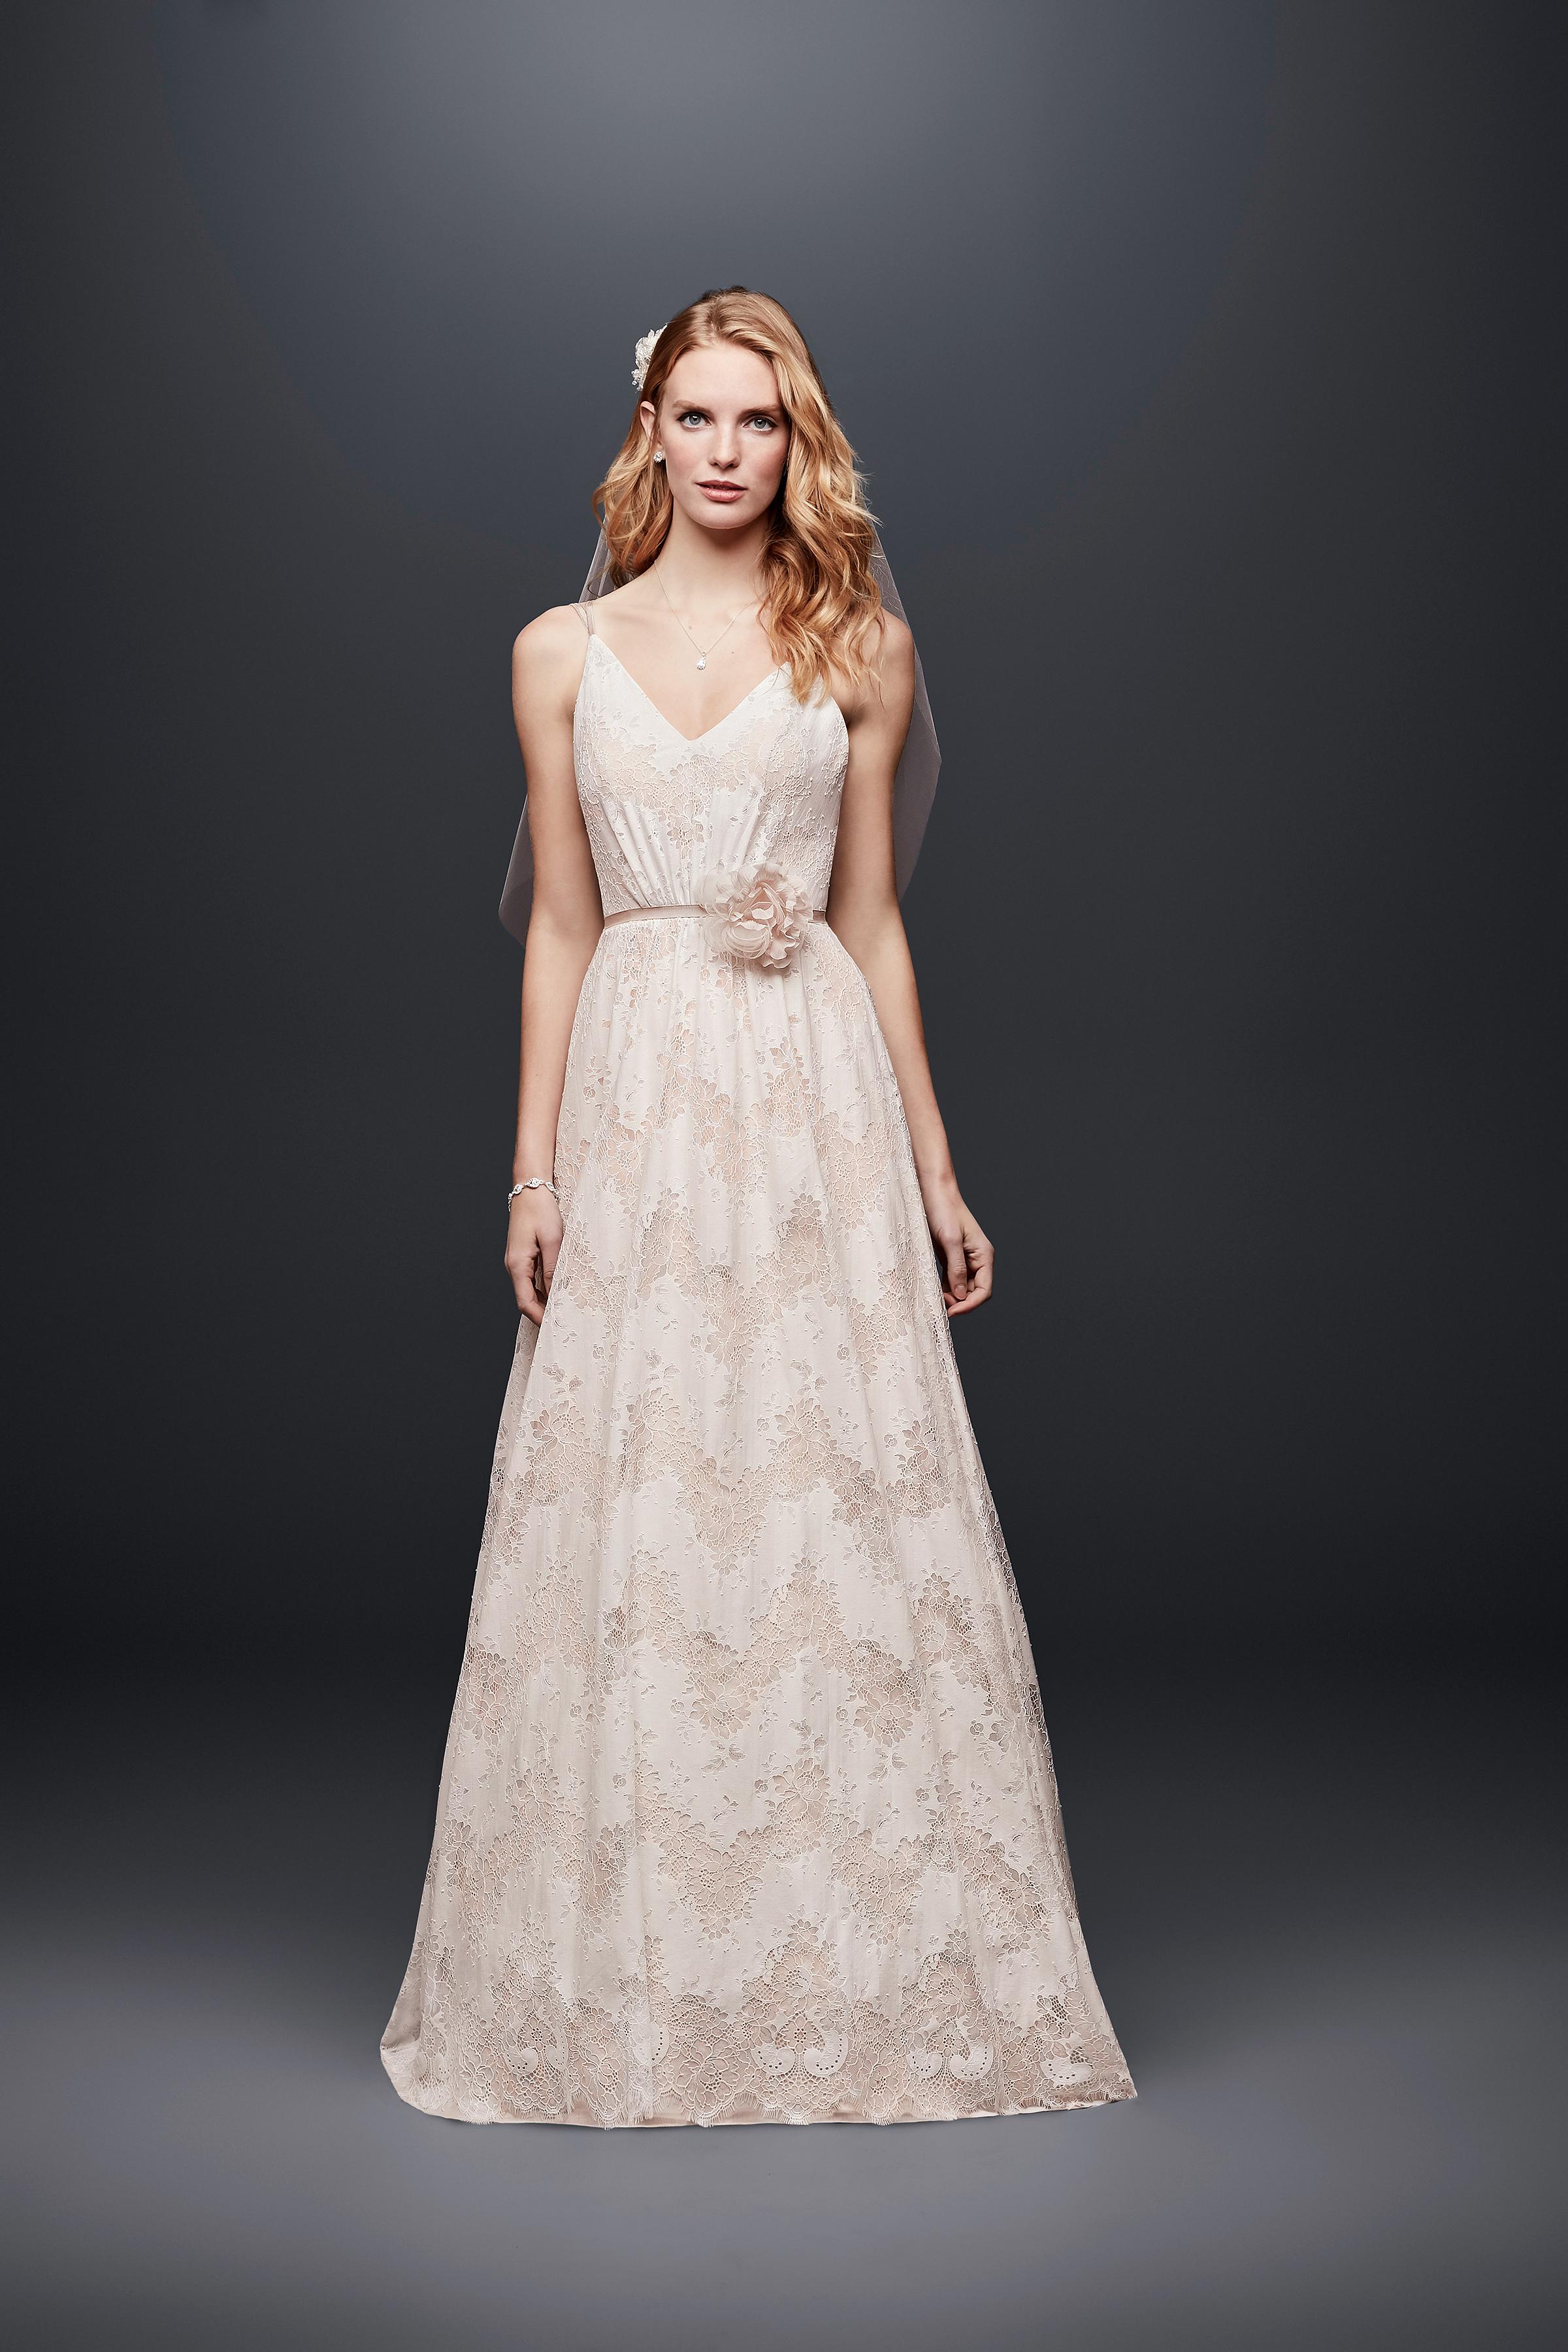 david bridal wedding dress spring 2019 spaghetti strap v-neck a-line